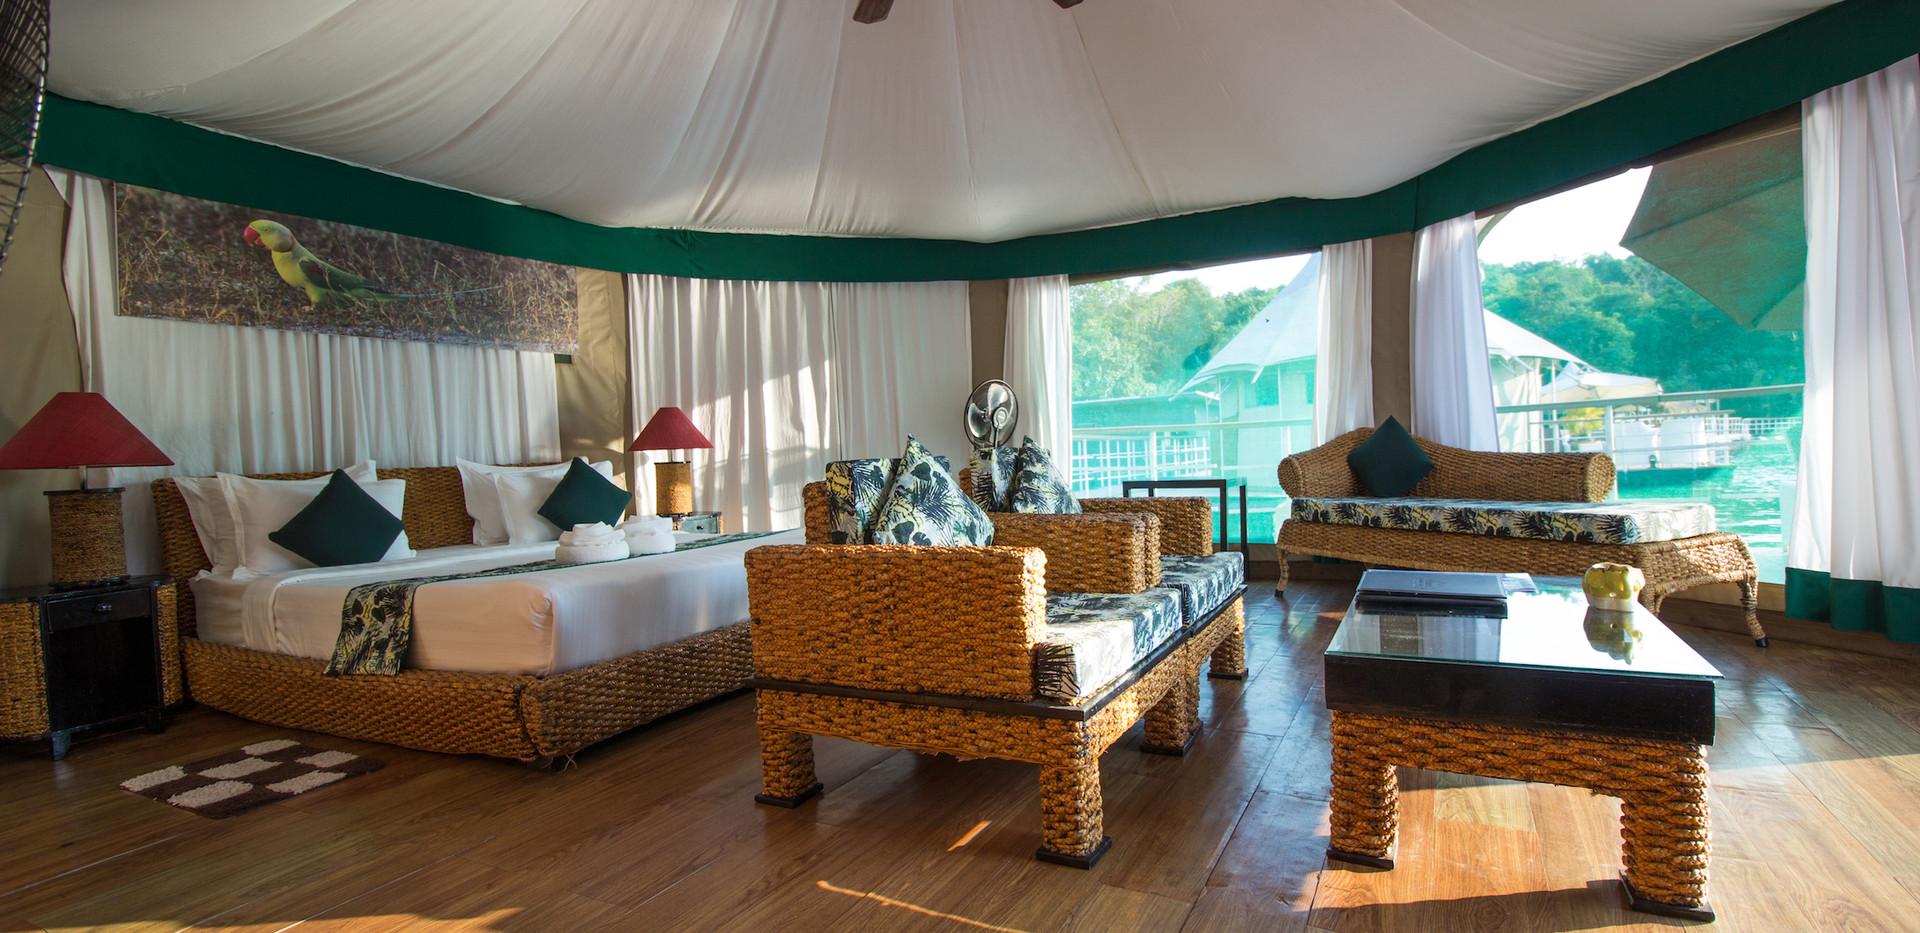 Thailand Yoga Holidays Destination River Resort Accommodation